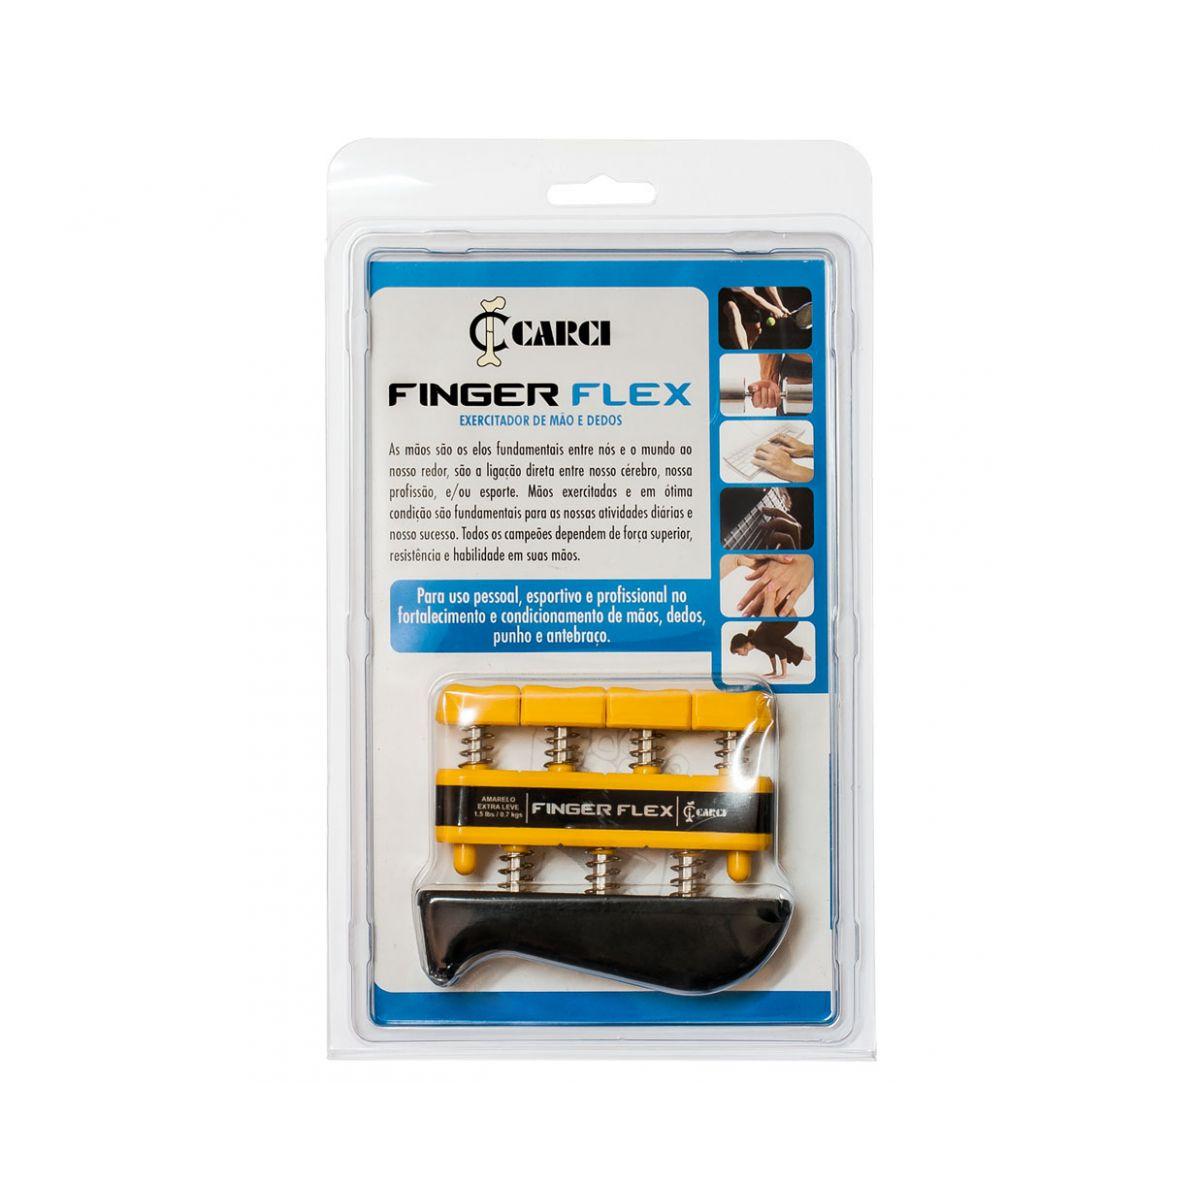 Finger Flex Preto: 9.0 lbs - 4,1 kg